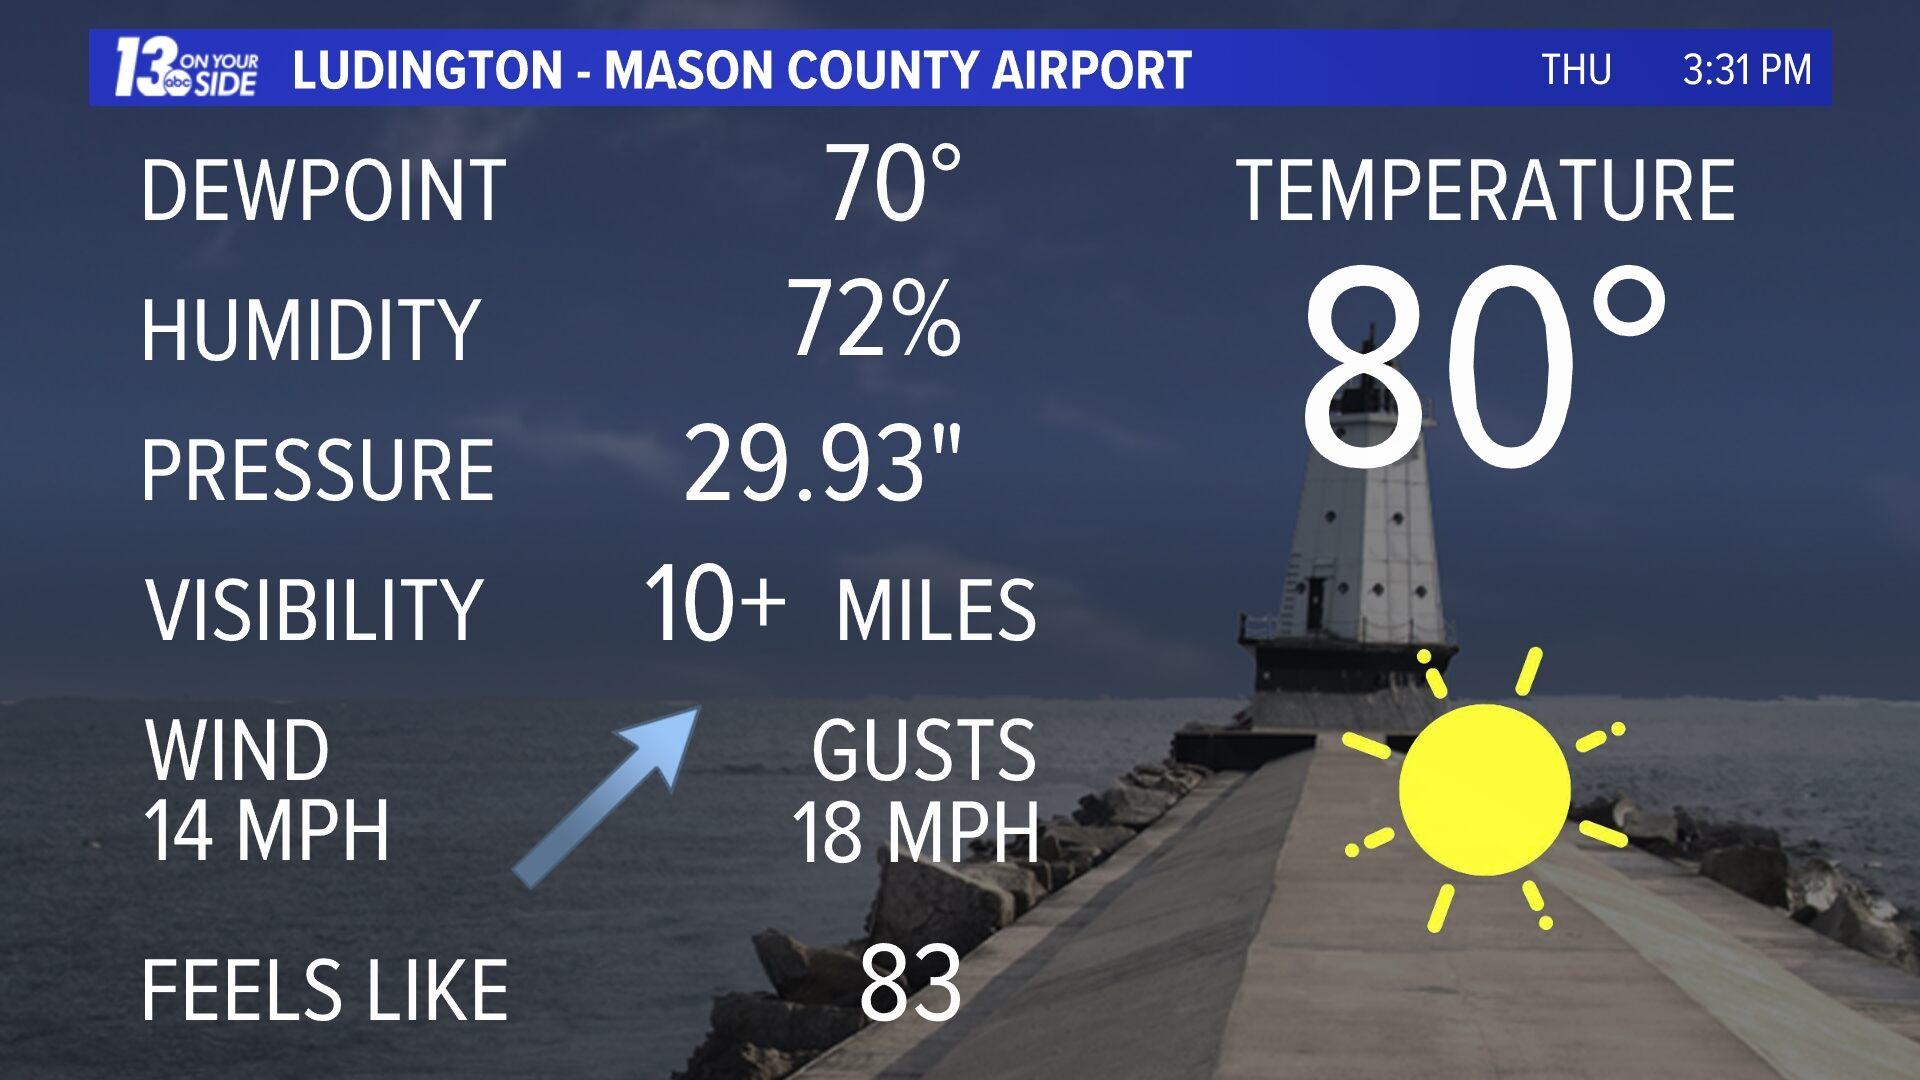 Ludington - Mason County Airport